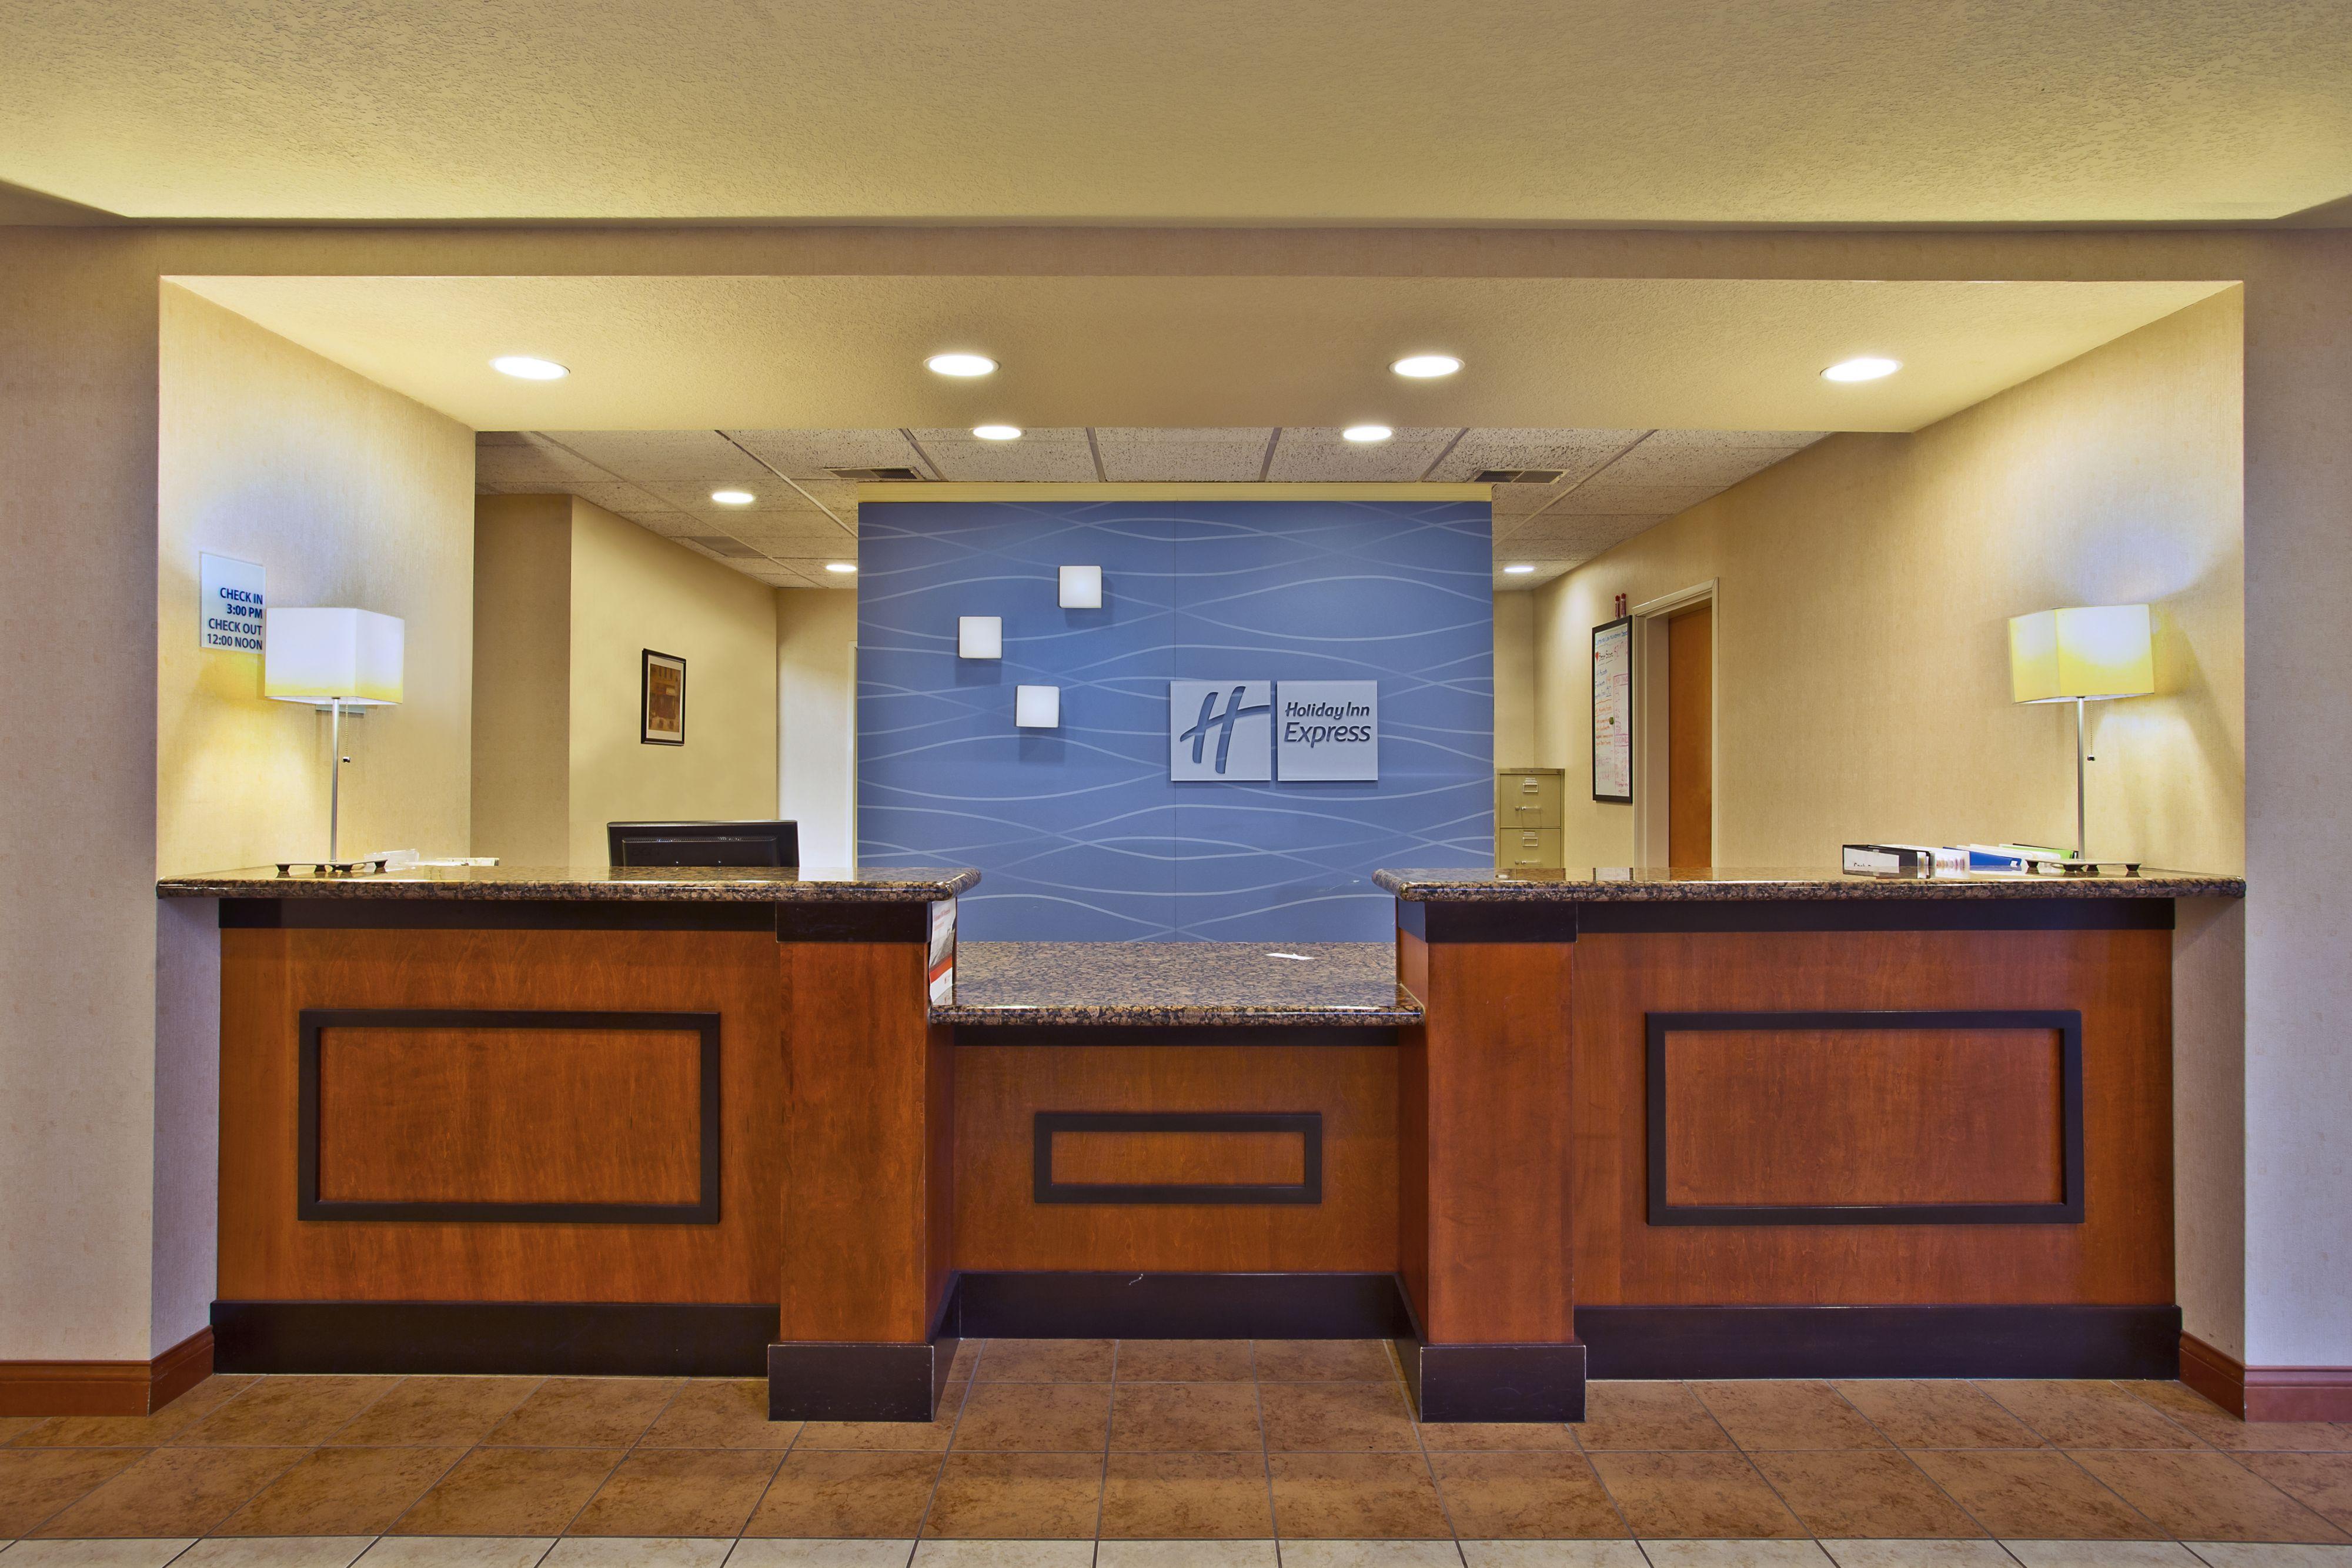 Holiday Inn Express & Suites East Lansing image 9